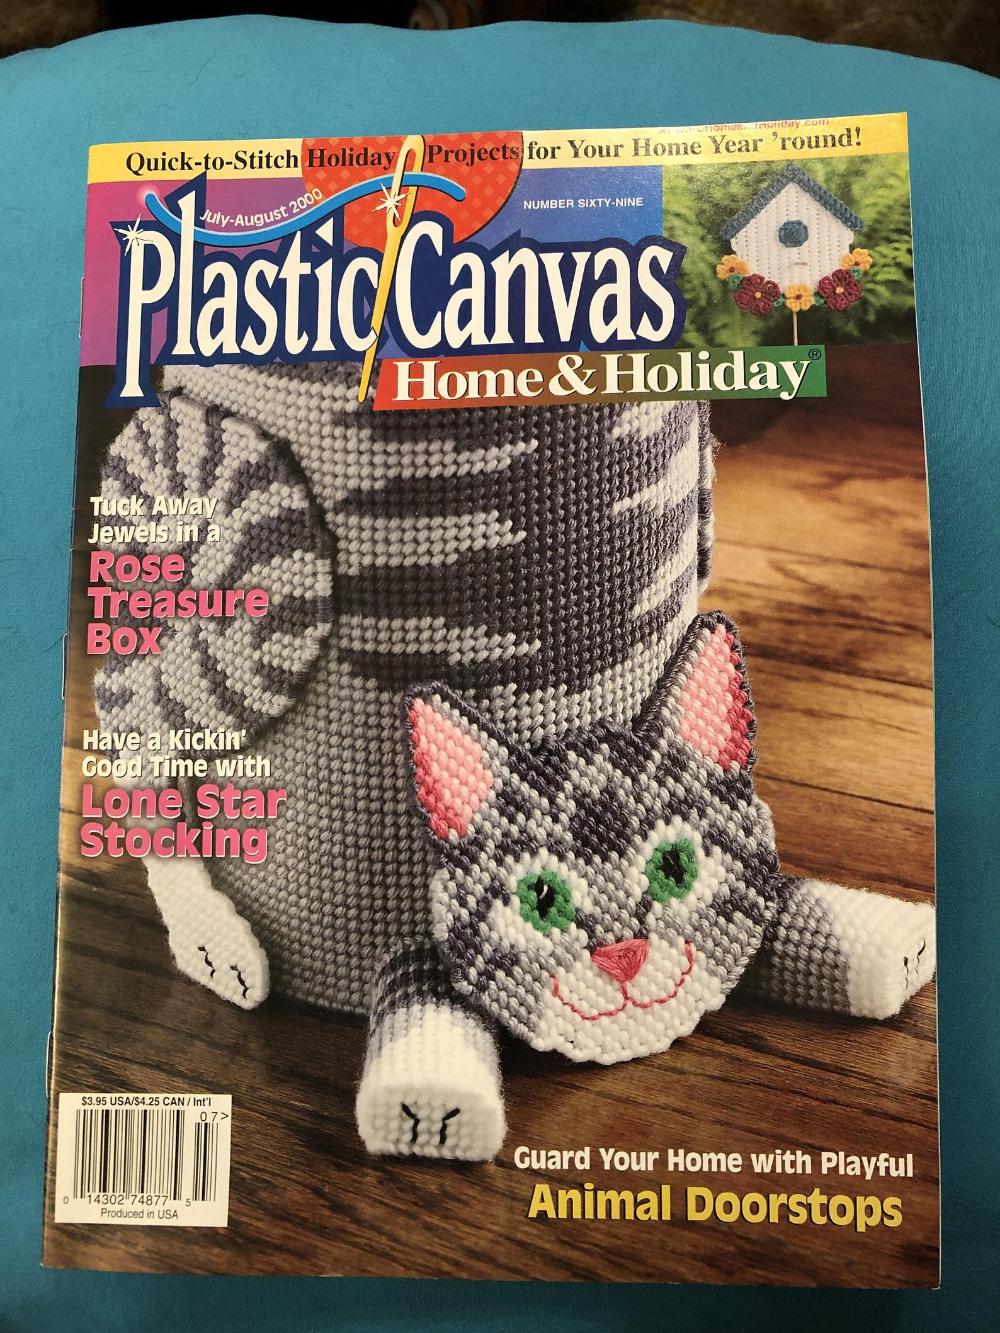 July 2000 Plastic Canvas Home /& Holiday No 69 Rose Treasure Box Lone Star Stocking